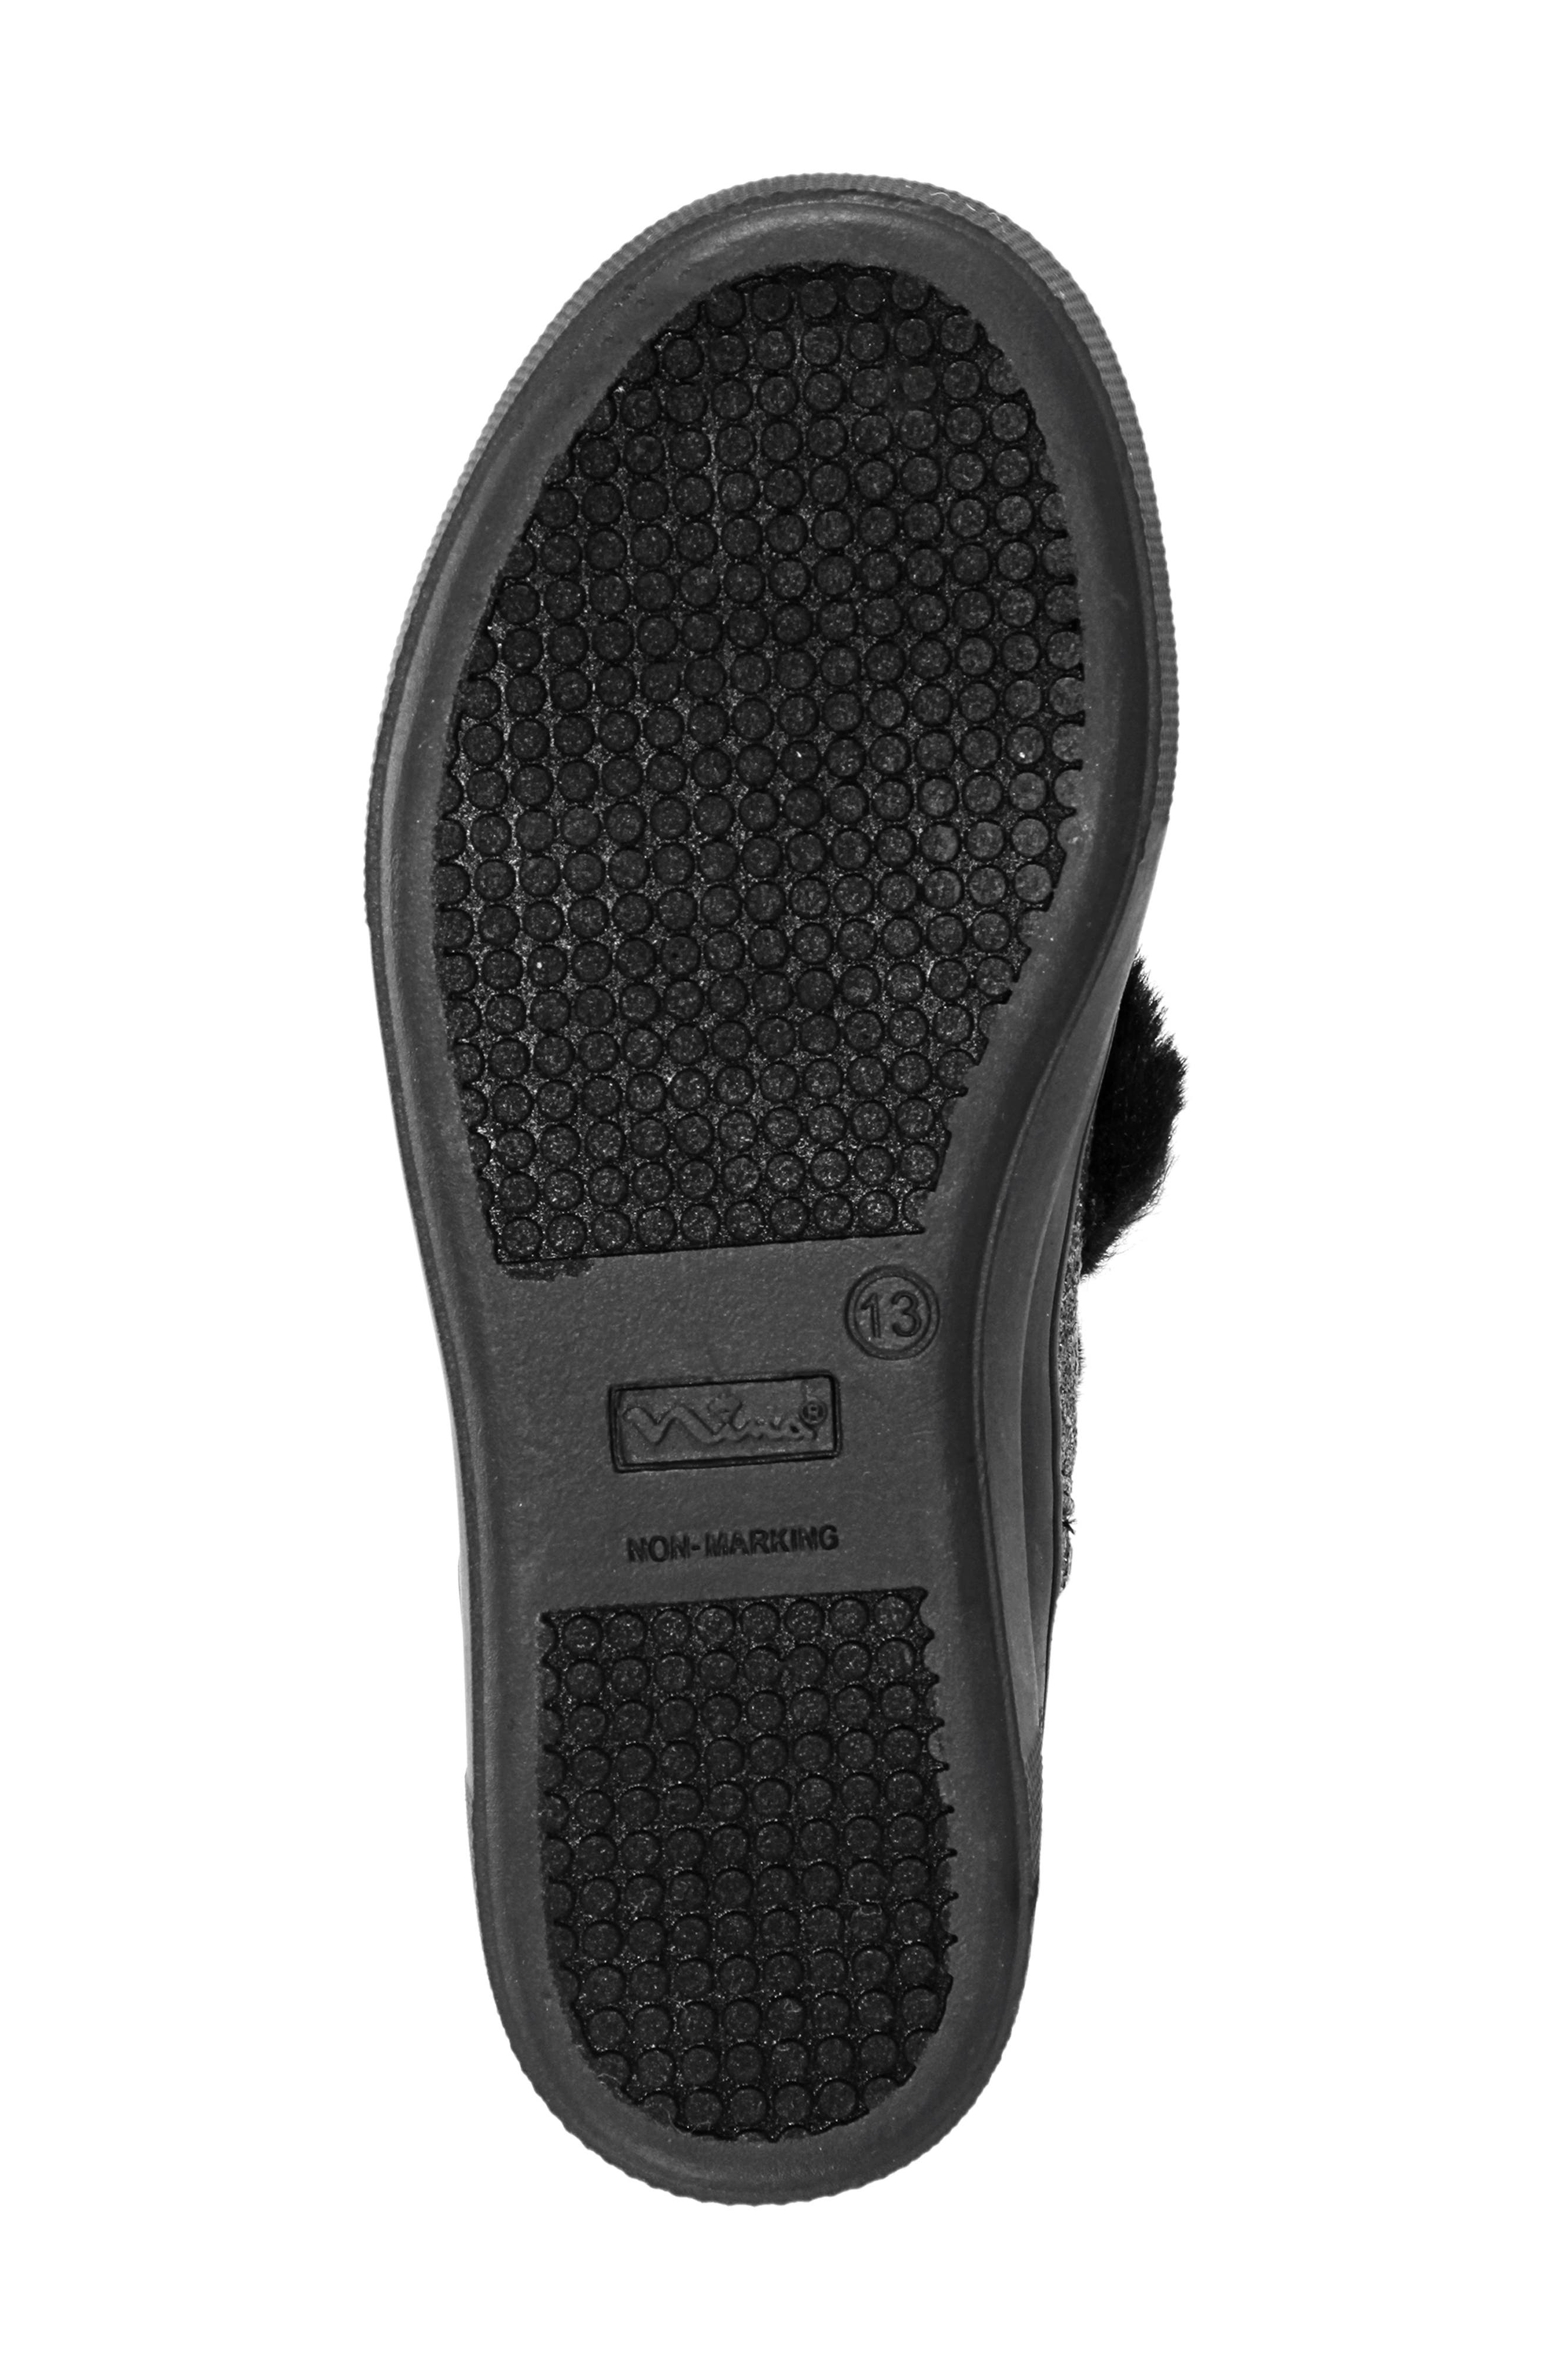 Helen Faux Fur Bootie Sneaker,                             Alternate thumbnail 6, color,                             PEWTER CRACKLE METALLIC